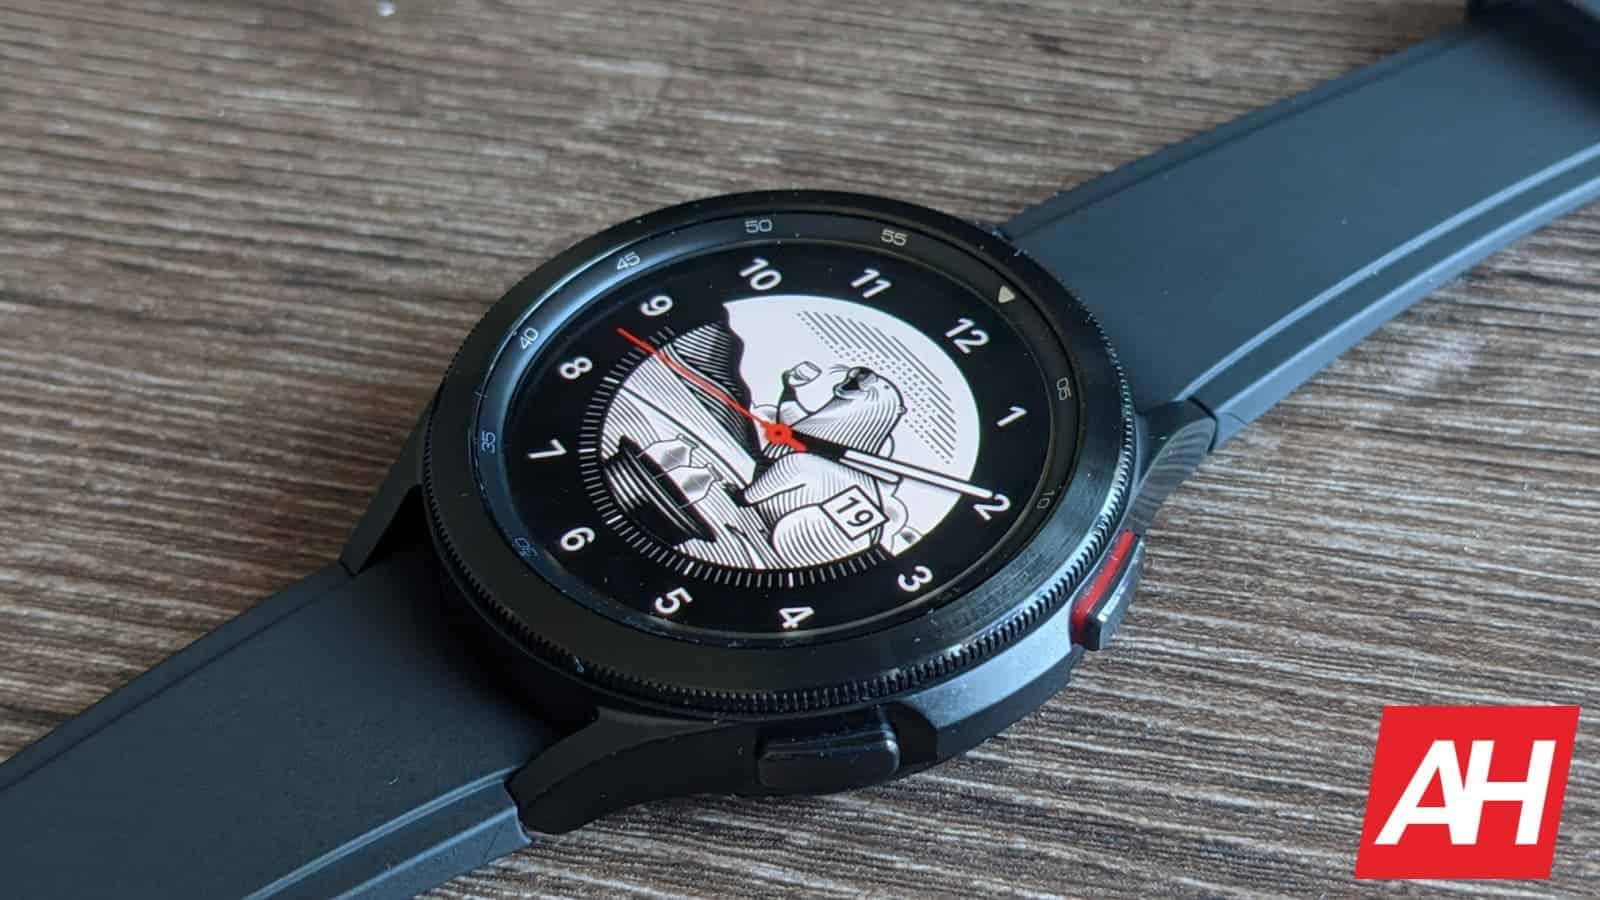 Samsung Galaxy Watch 4 Classic Hands On 1